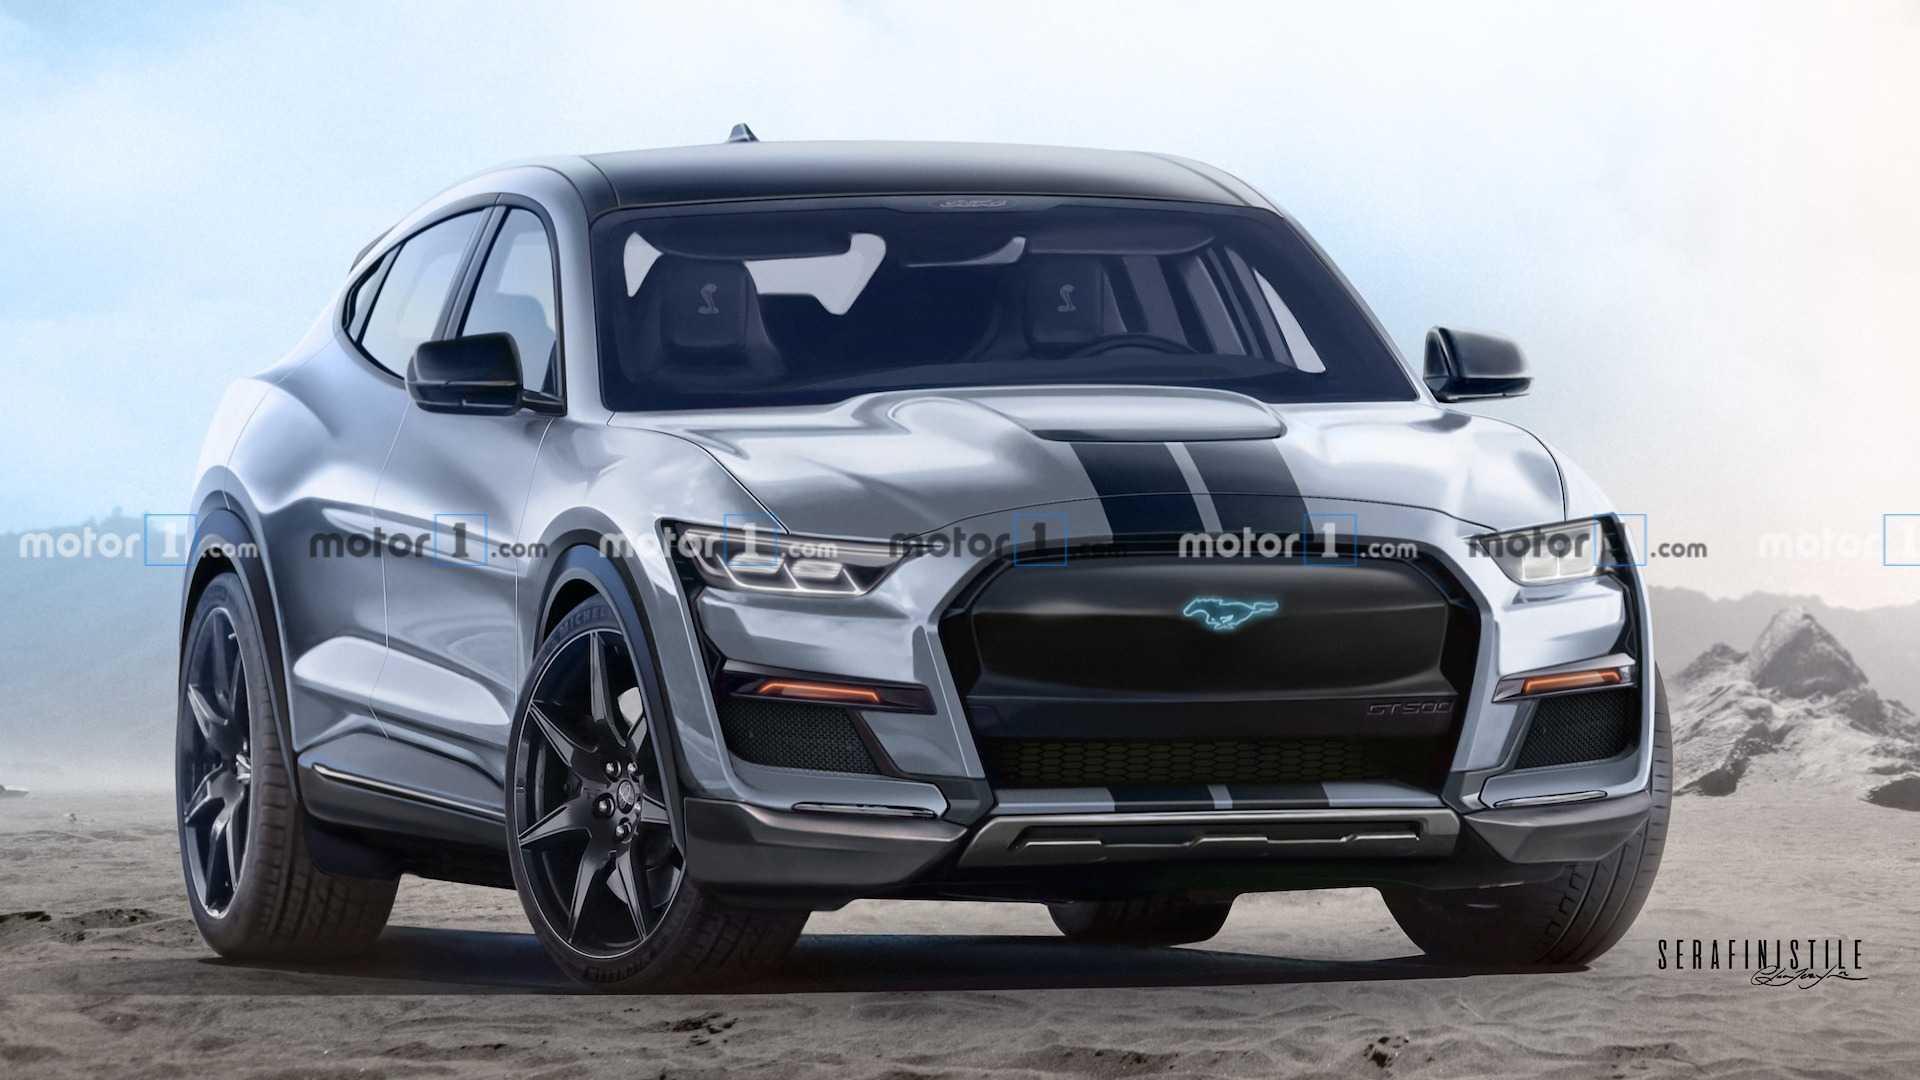 Ford Mustang Mach E Shelb E Renderings Predict The Inevitable